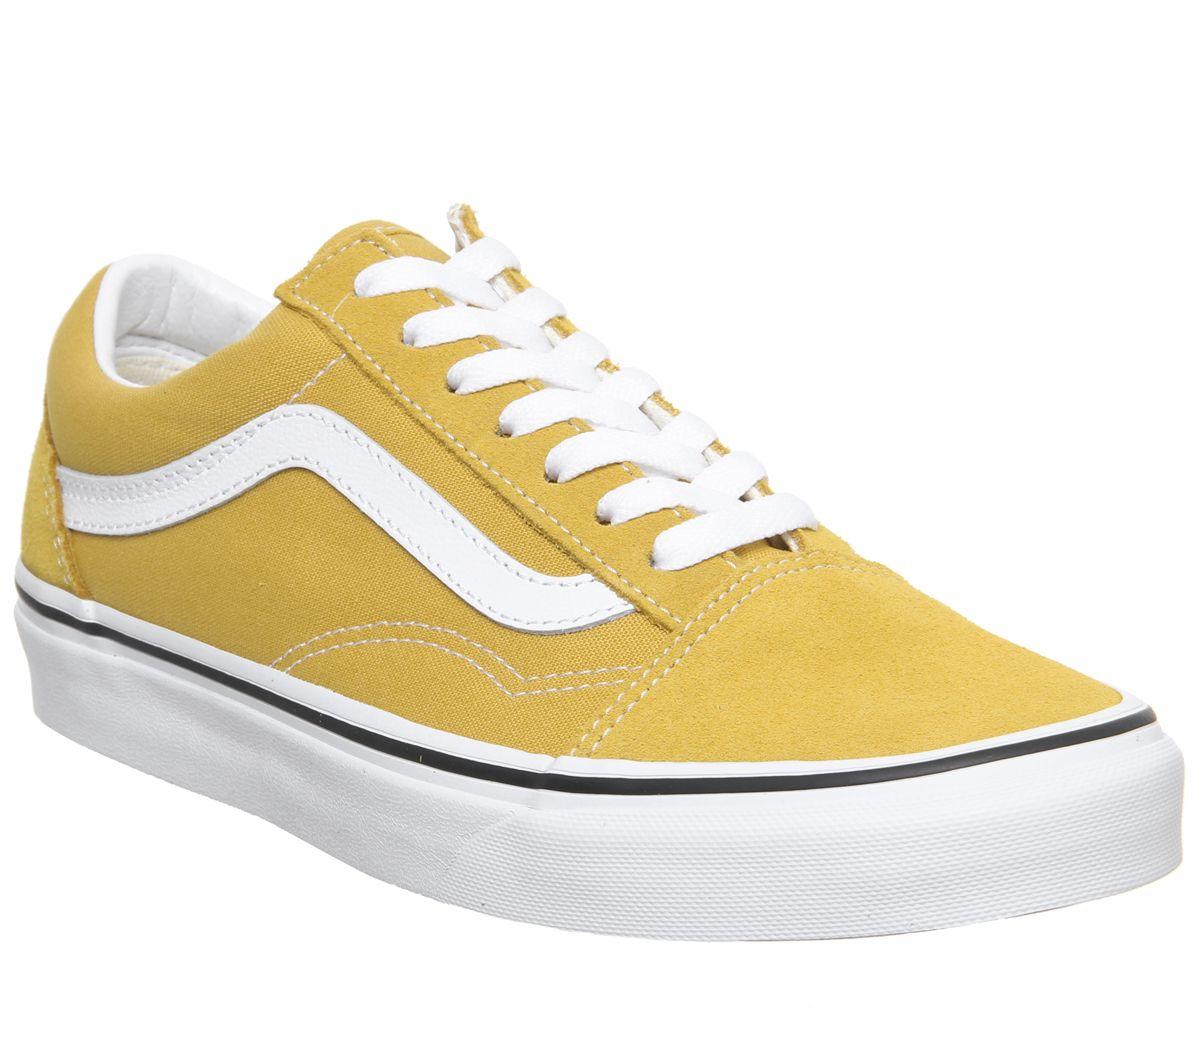 34286dc5d0e Vans Old Skool Trainers Yolk Yellow True White - Unisex Sports